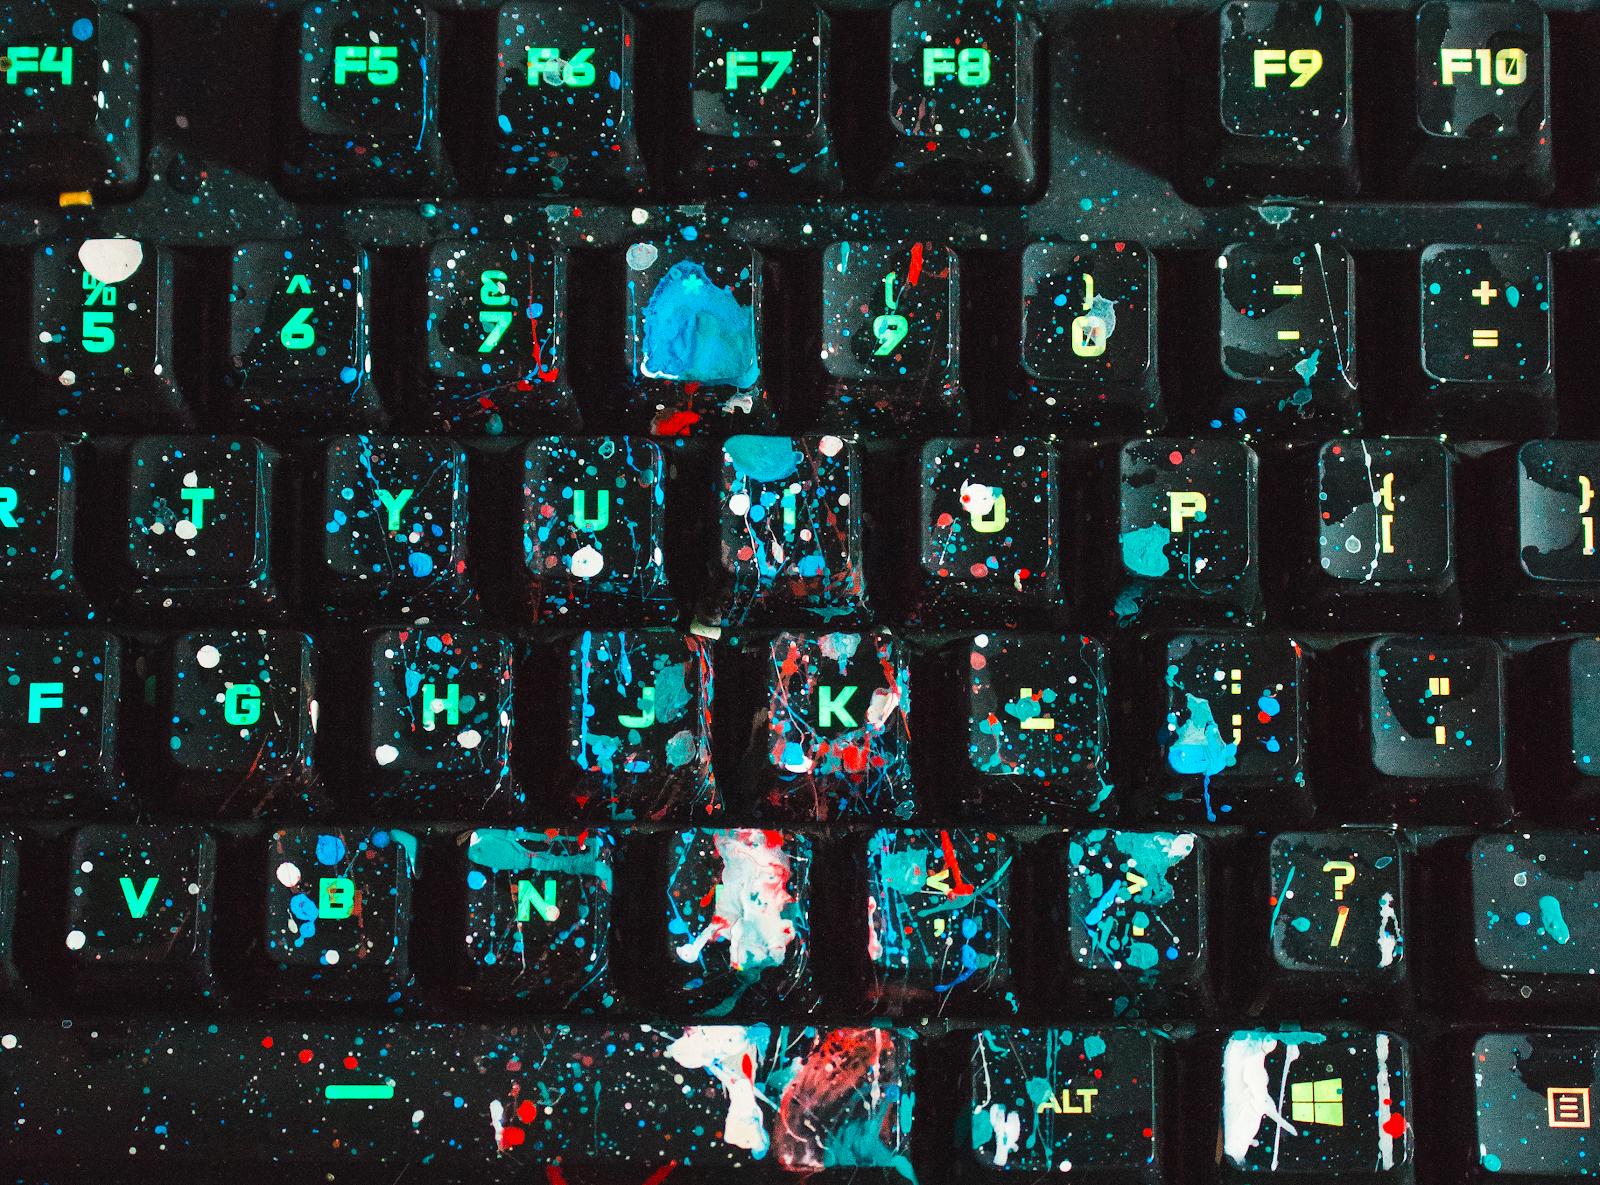 Image of splatter painted keyboard.